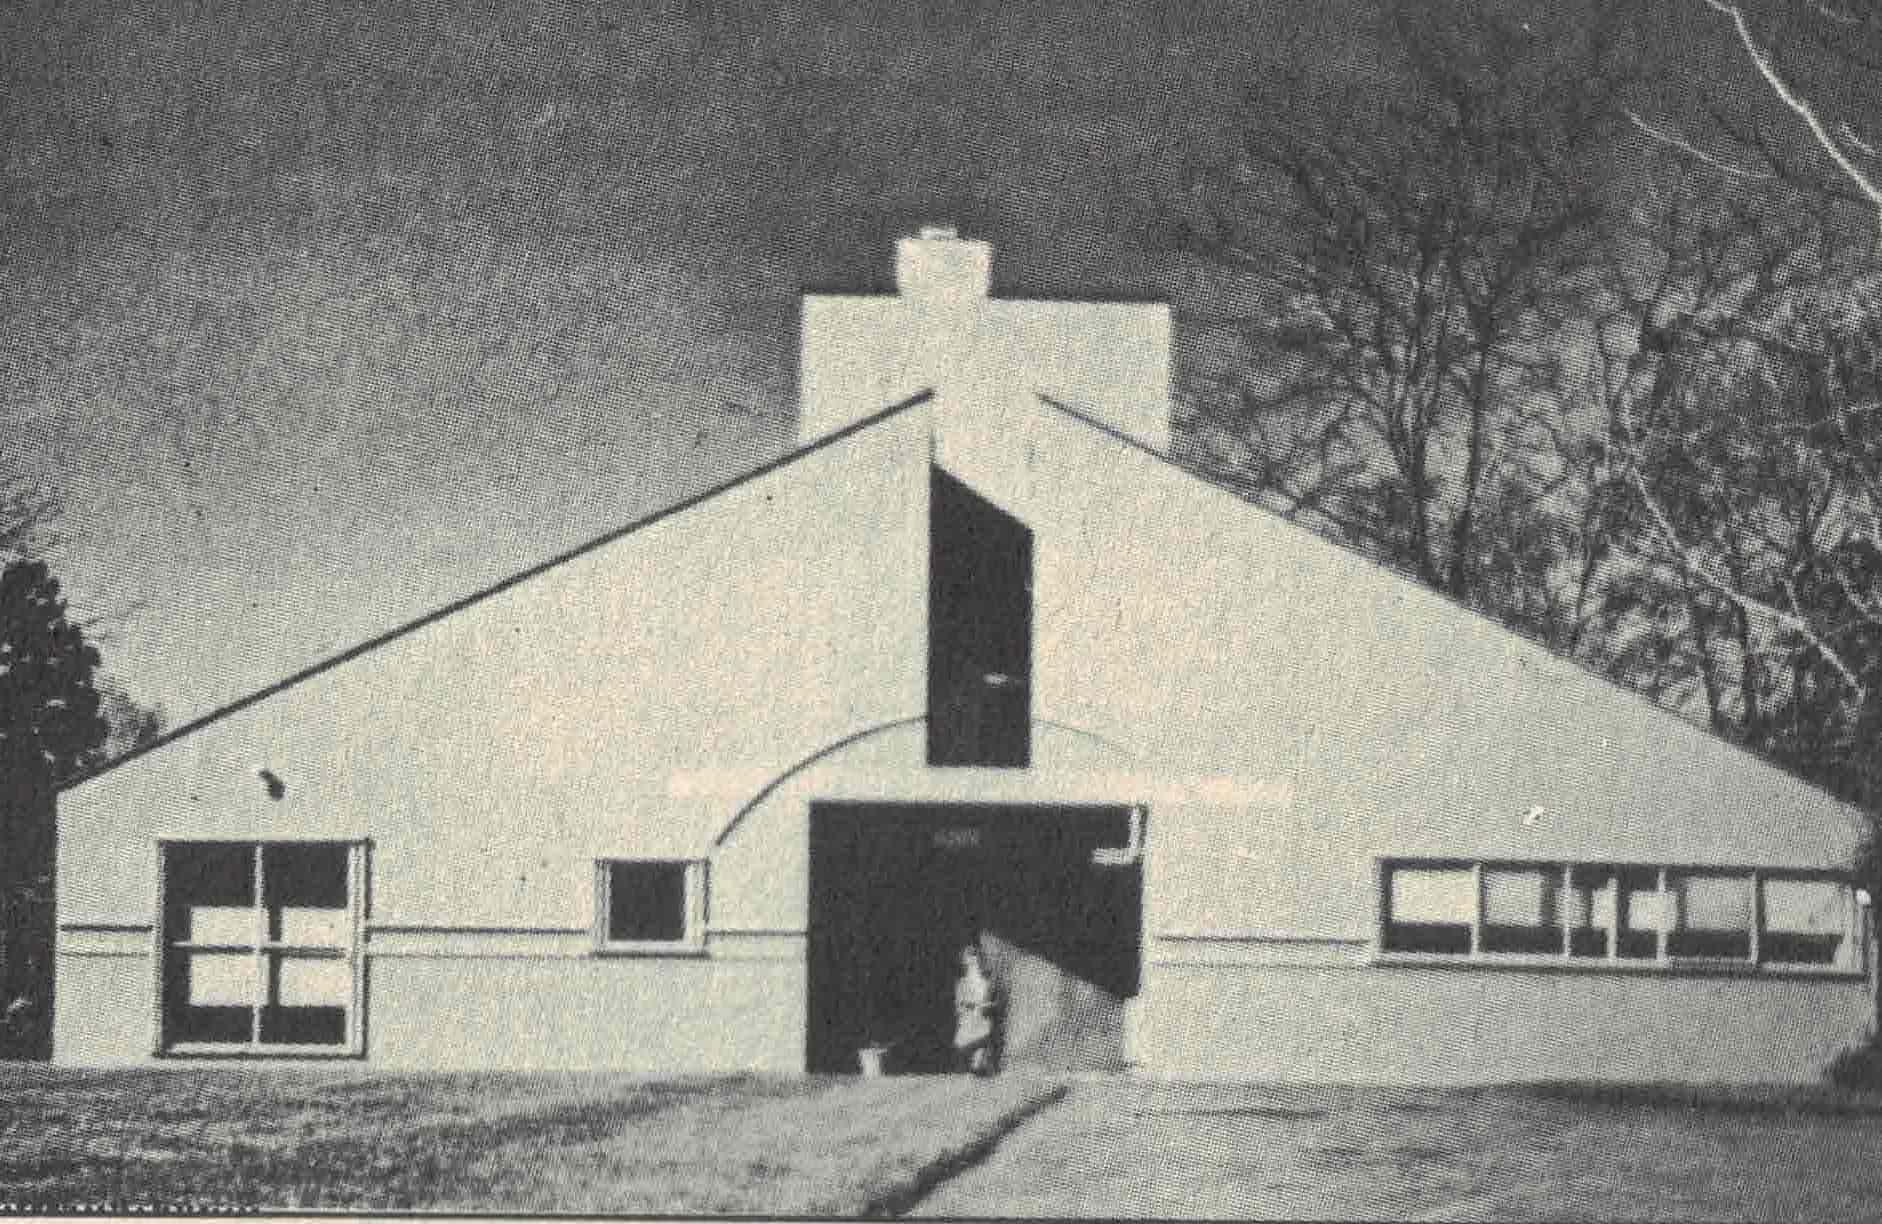 Figura 10. Venturi e Rauch, Chestnut Hill, 1962